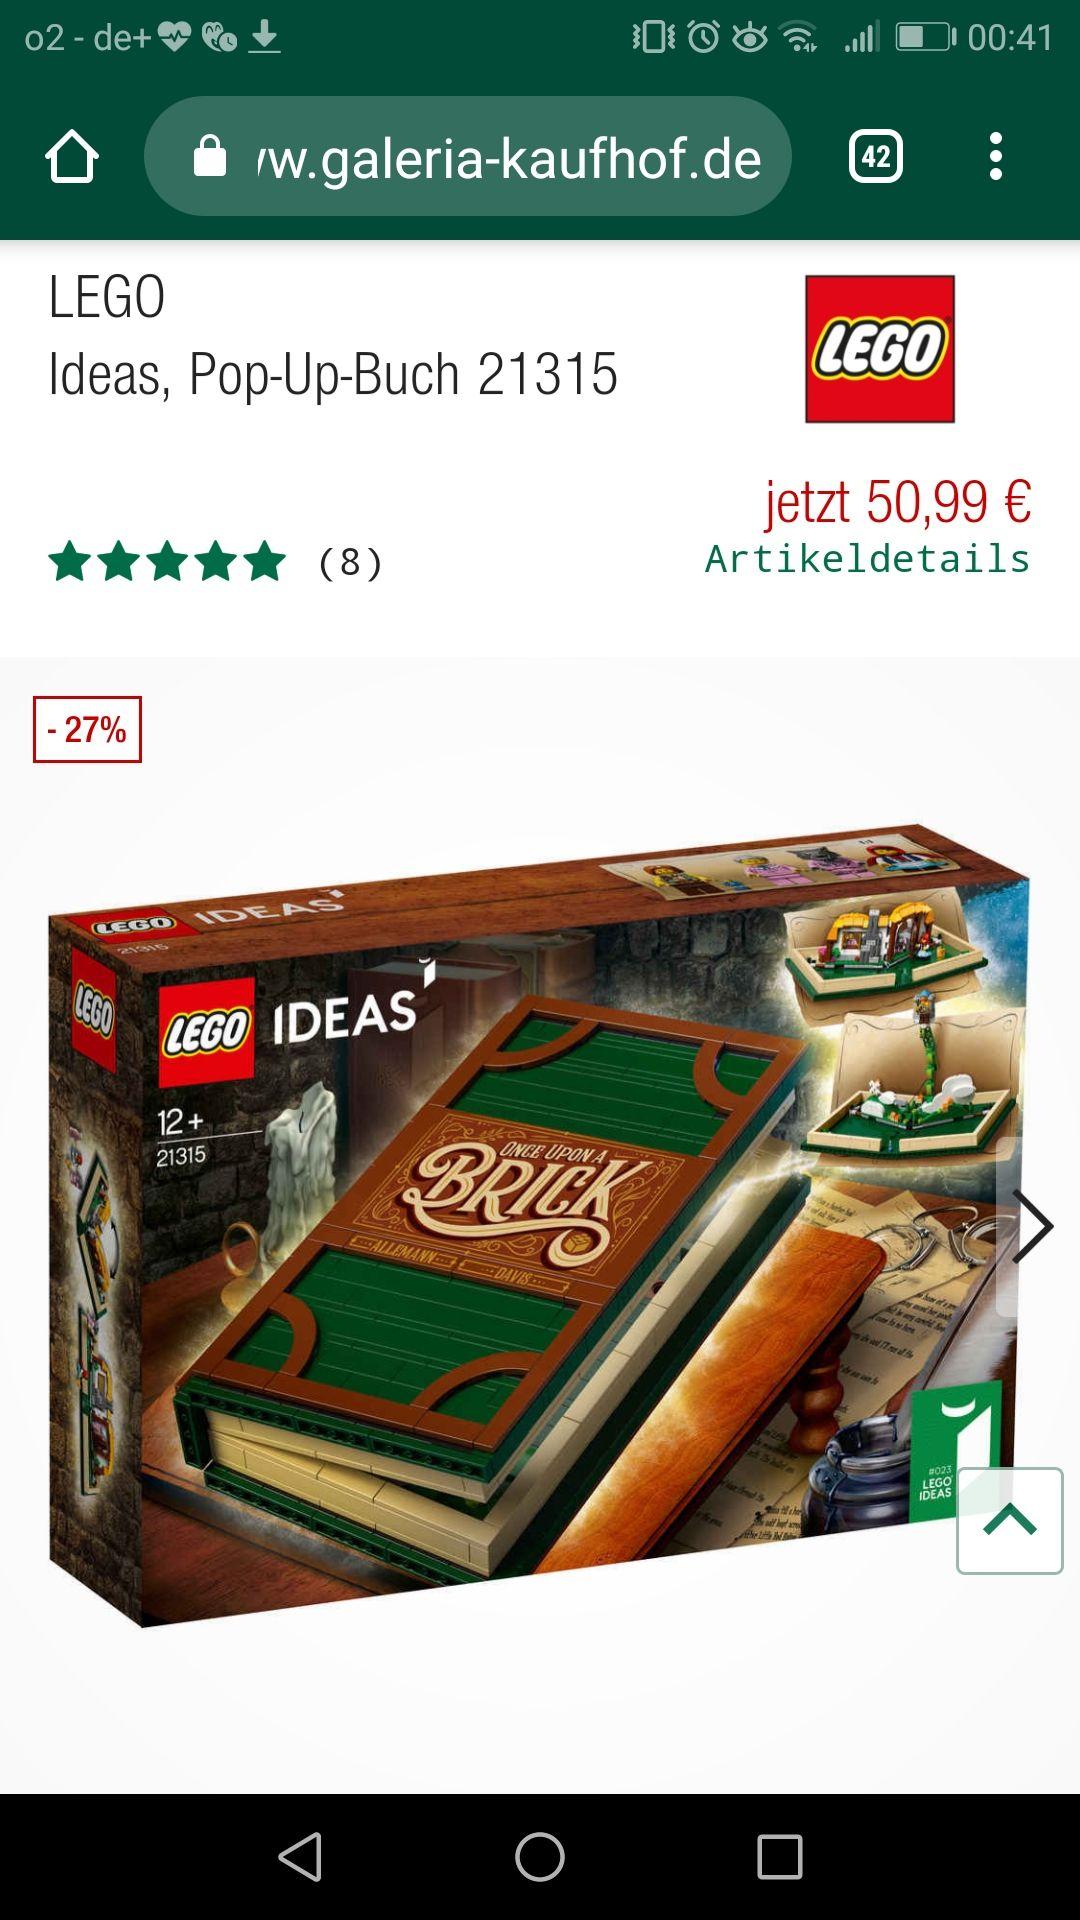 Galeria Kaufhof Lego Ideas 21315 Pop-Up Buch